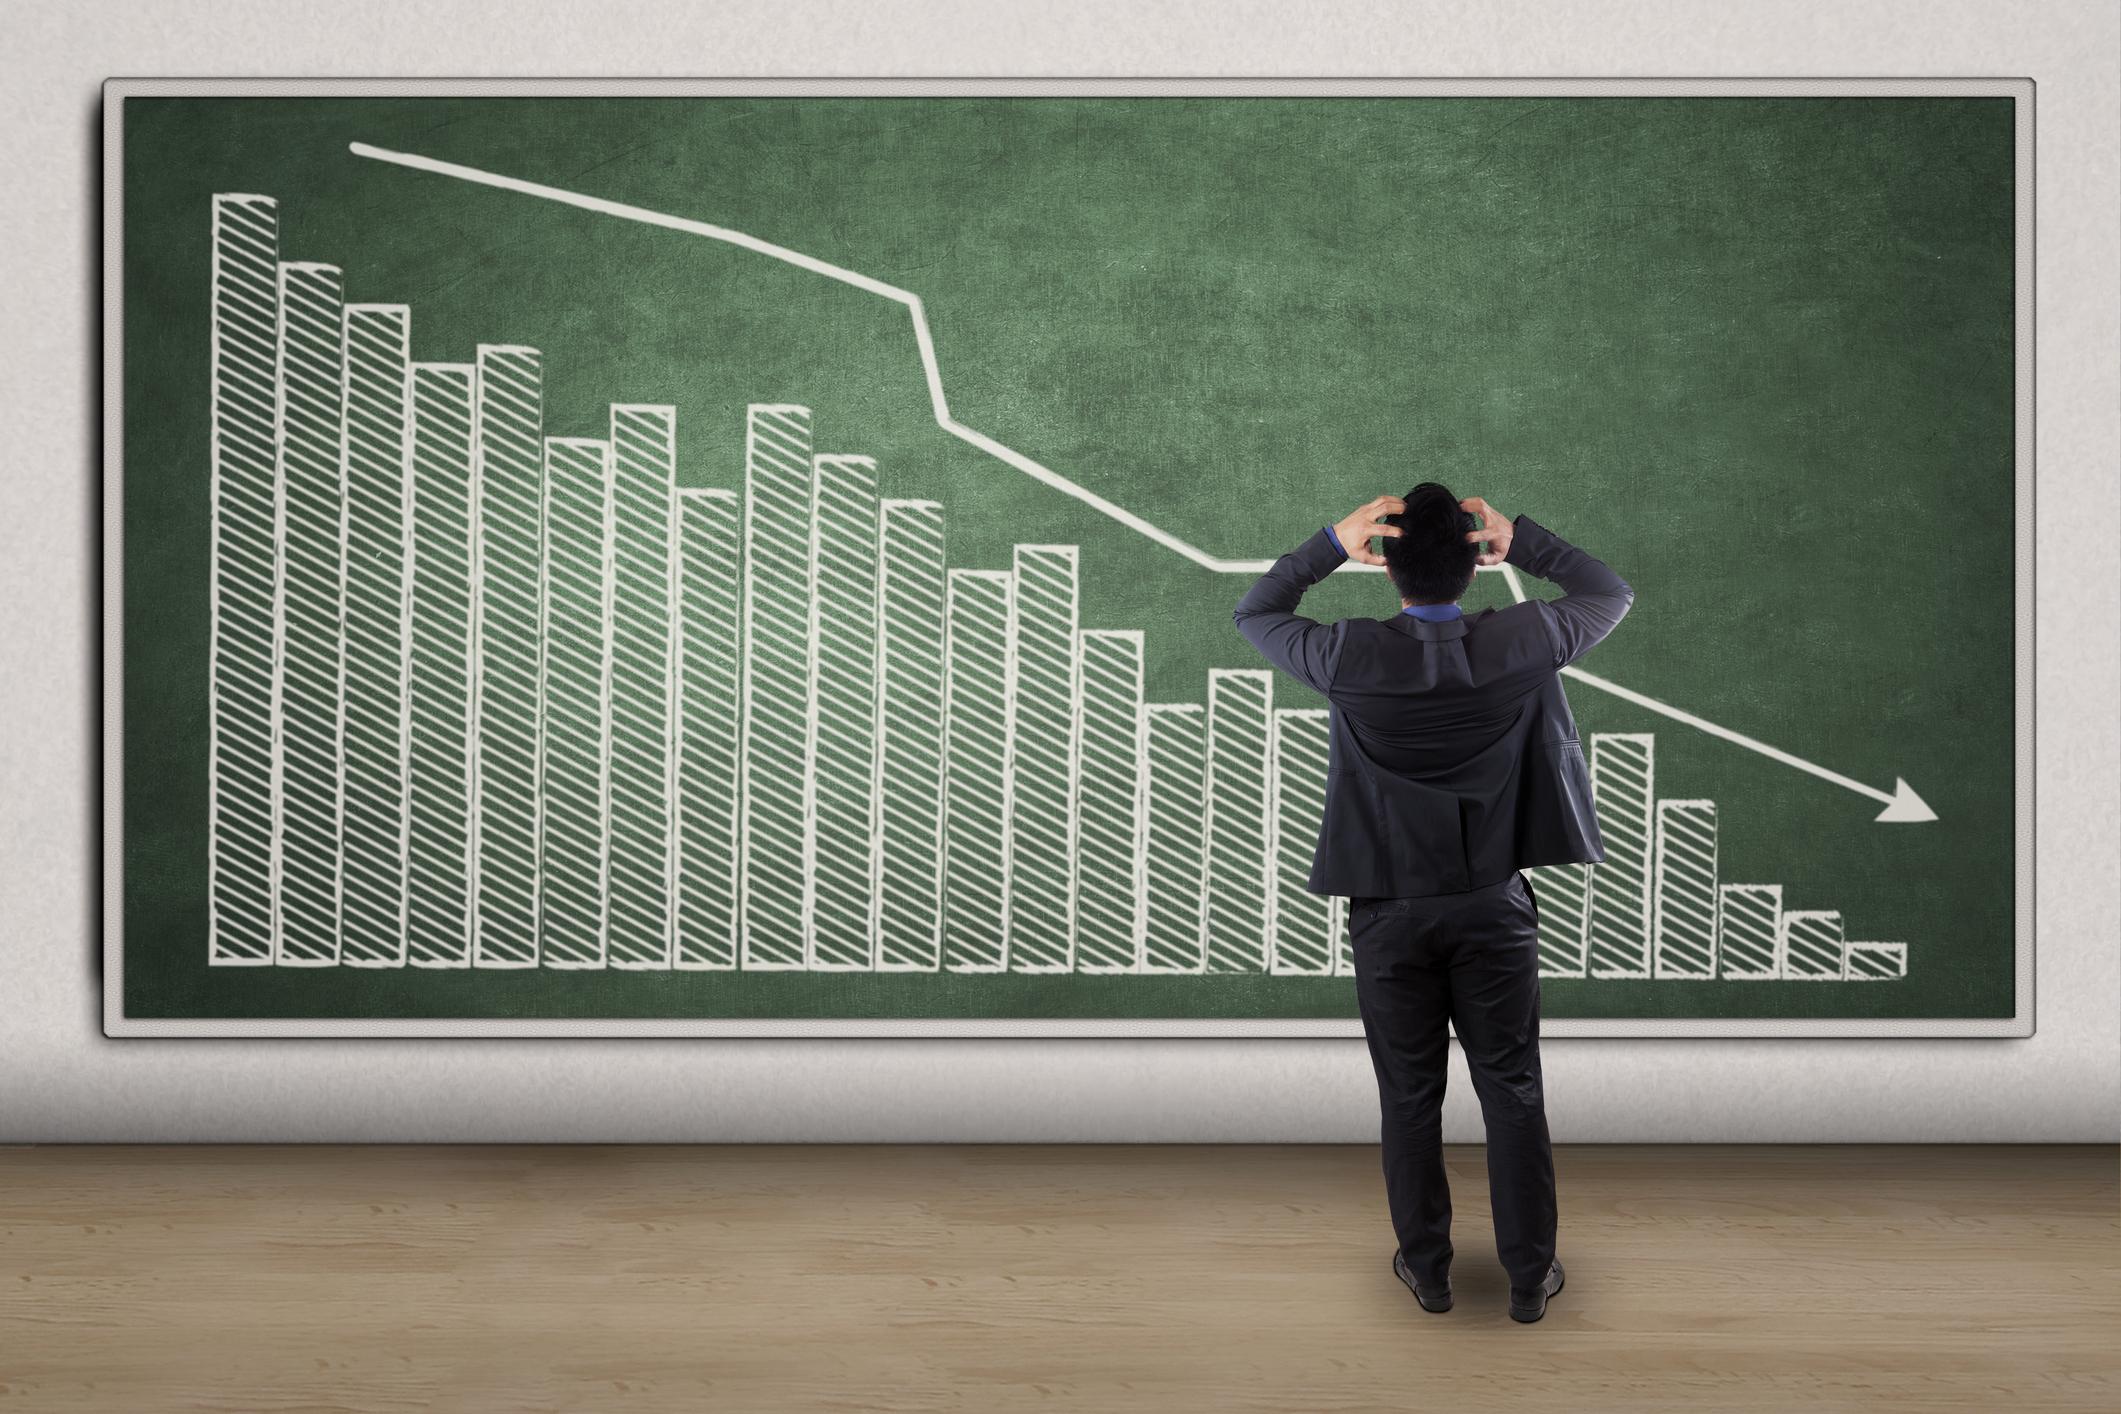 Valeant Pharmaceuticals stock price falling